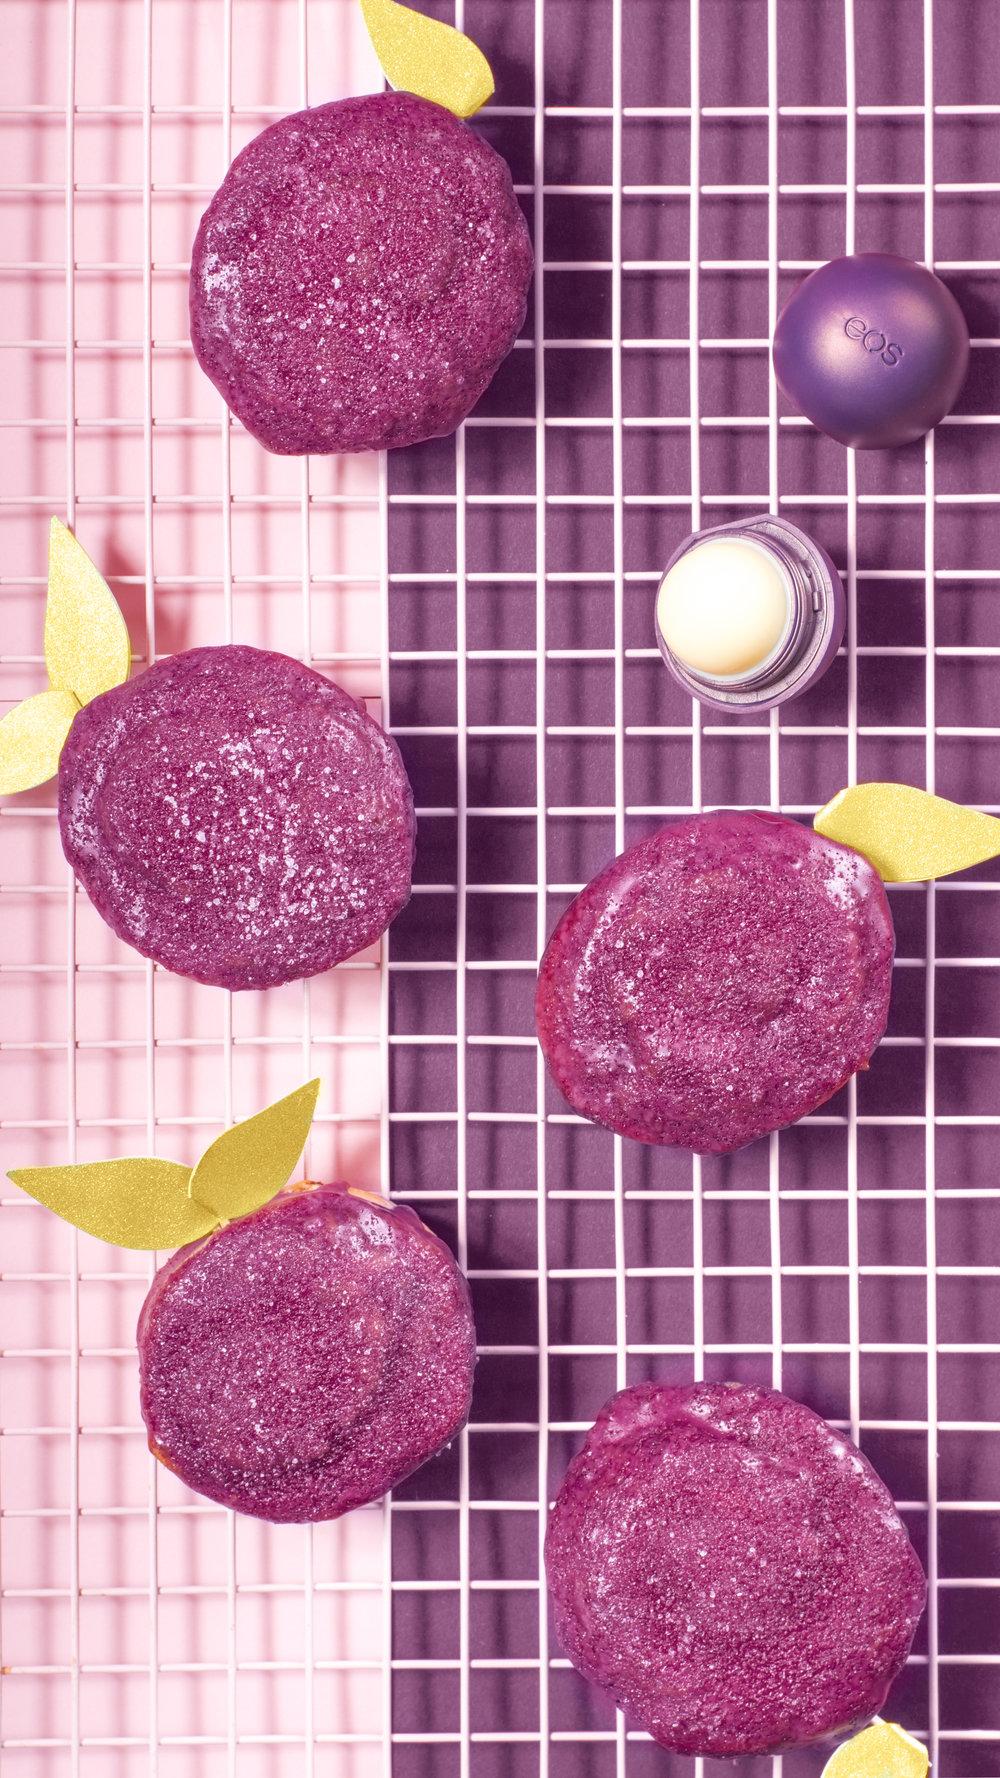 sugar plum 1.jpg